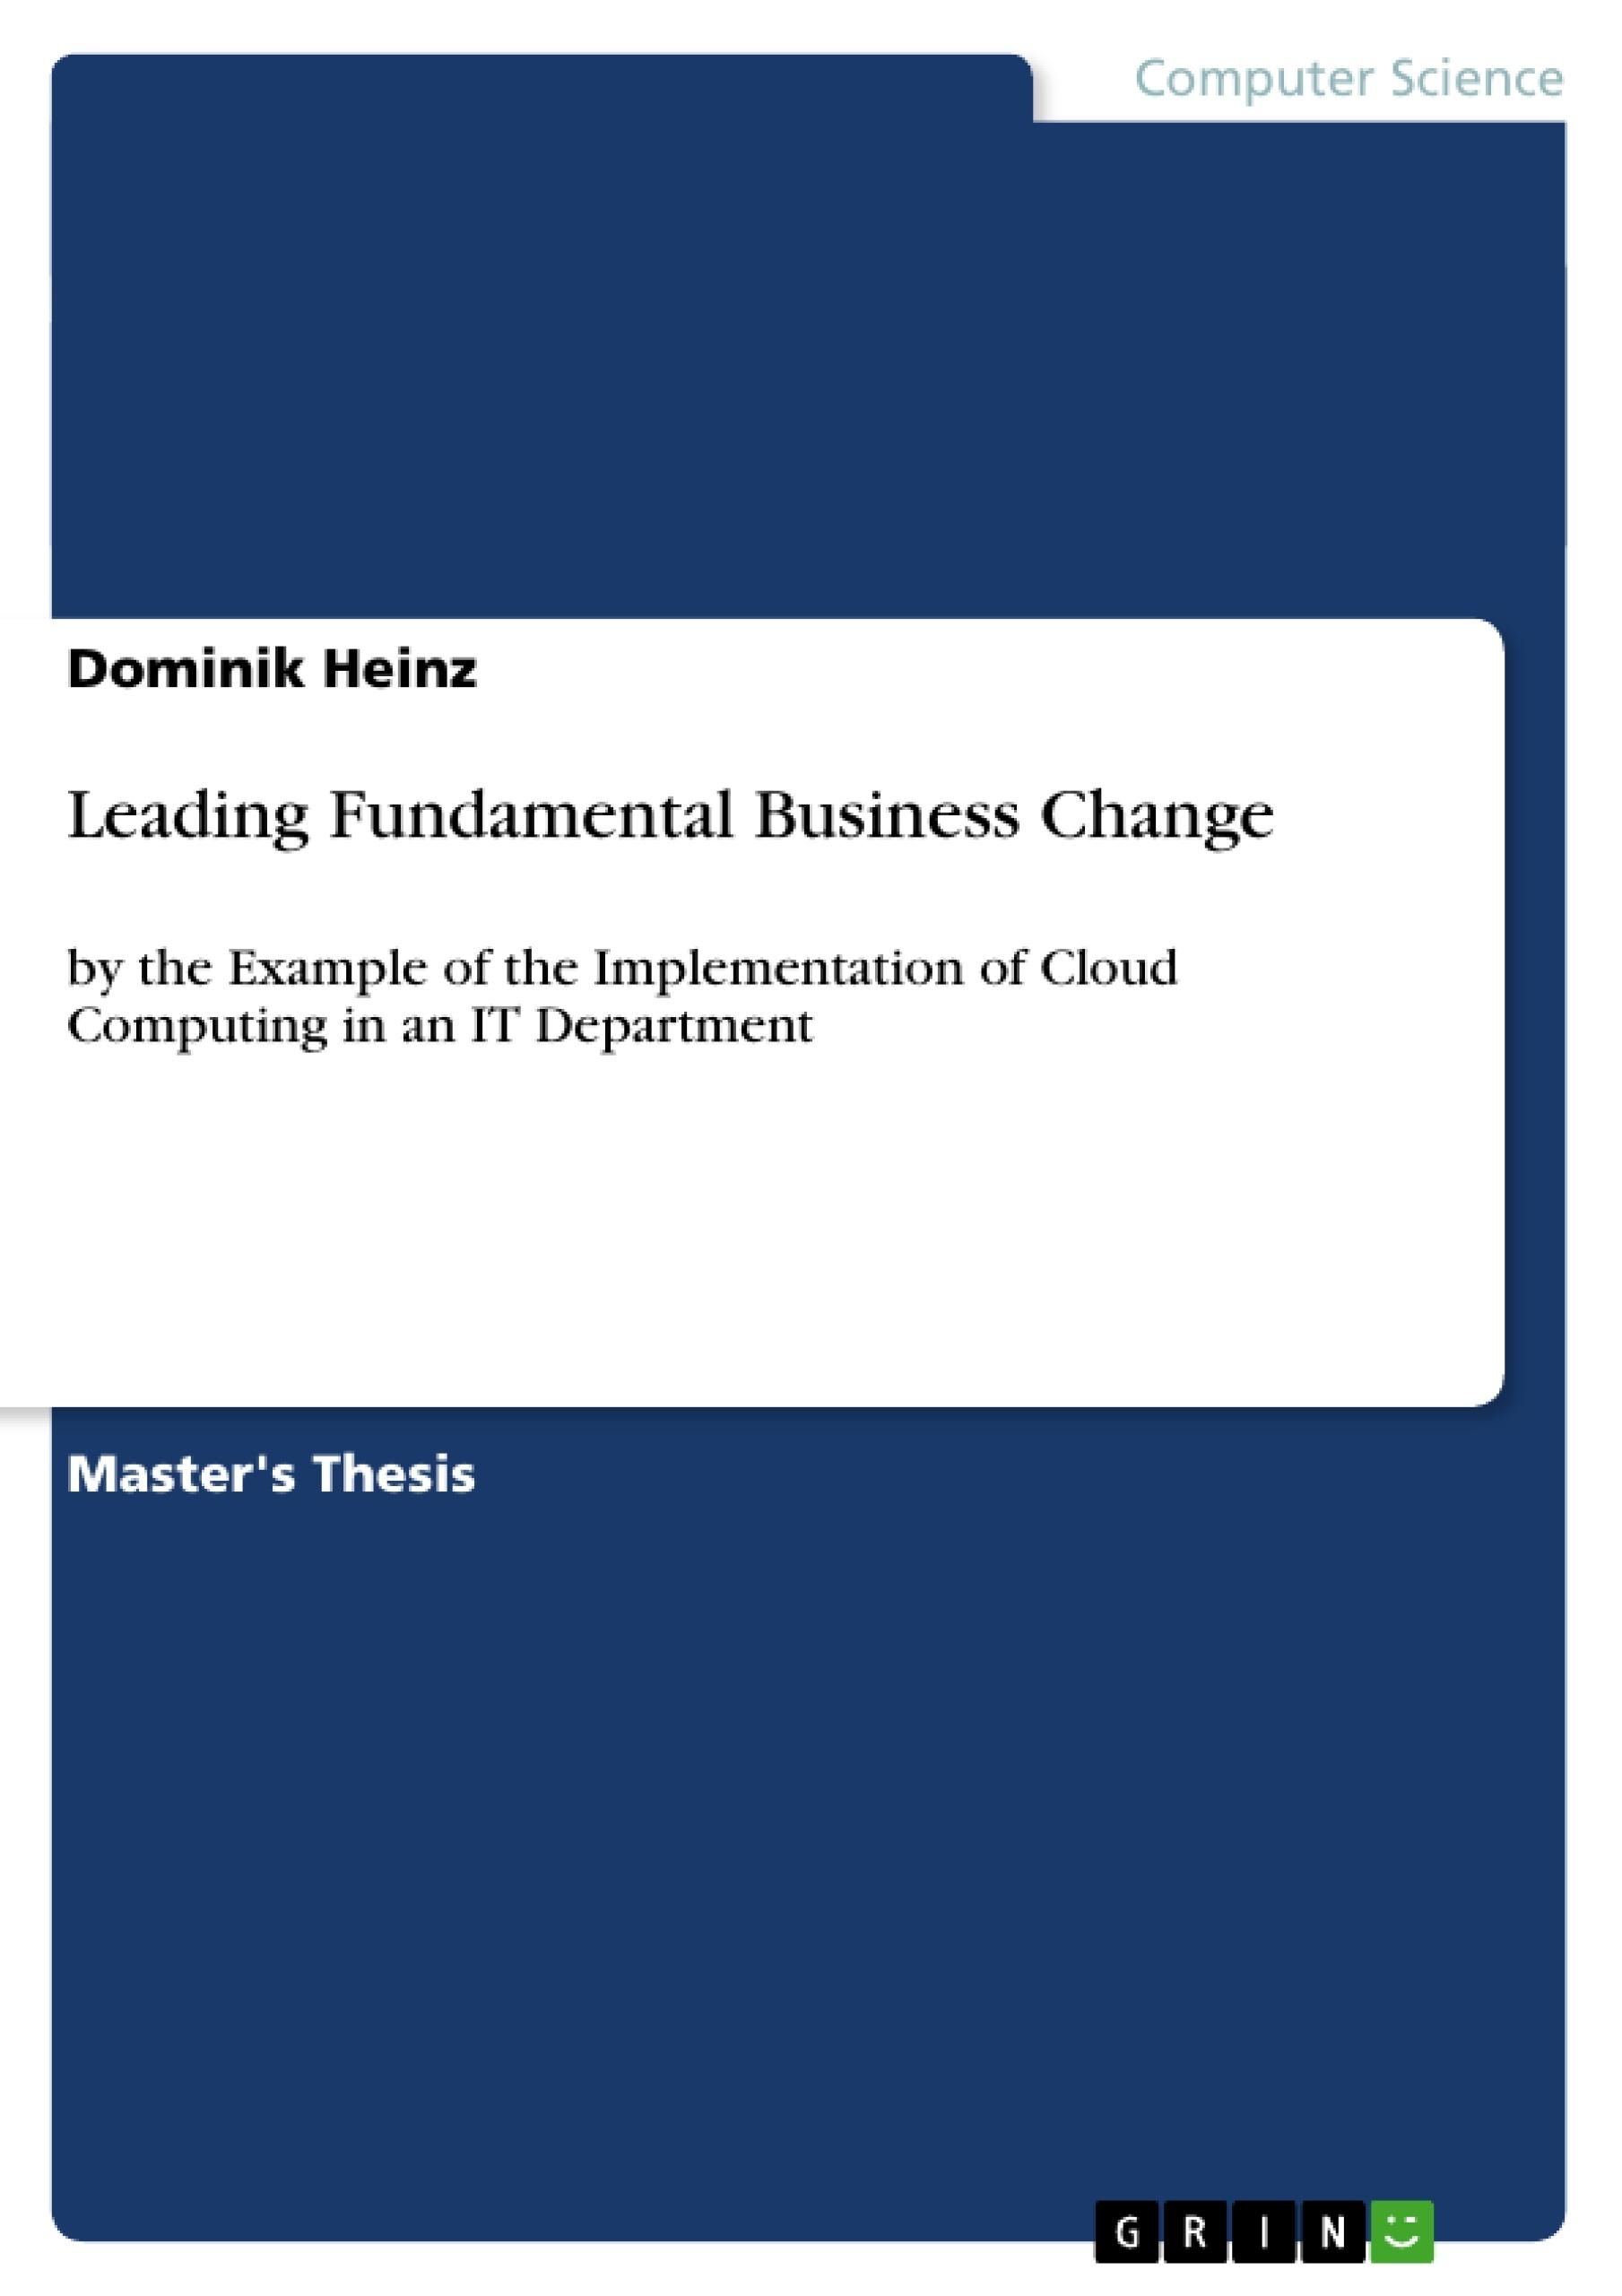 Title: Leading Fundamental Business Change